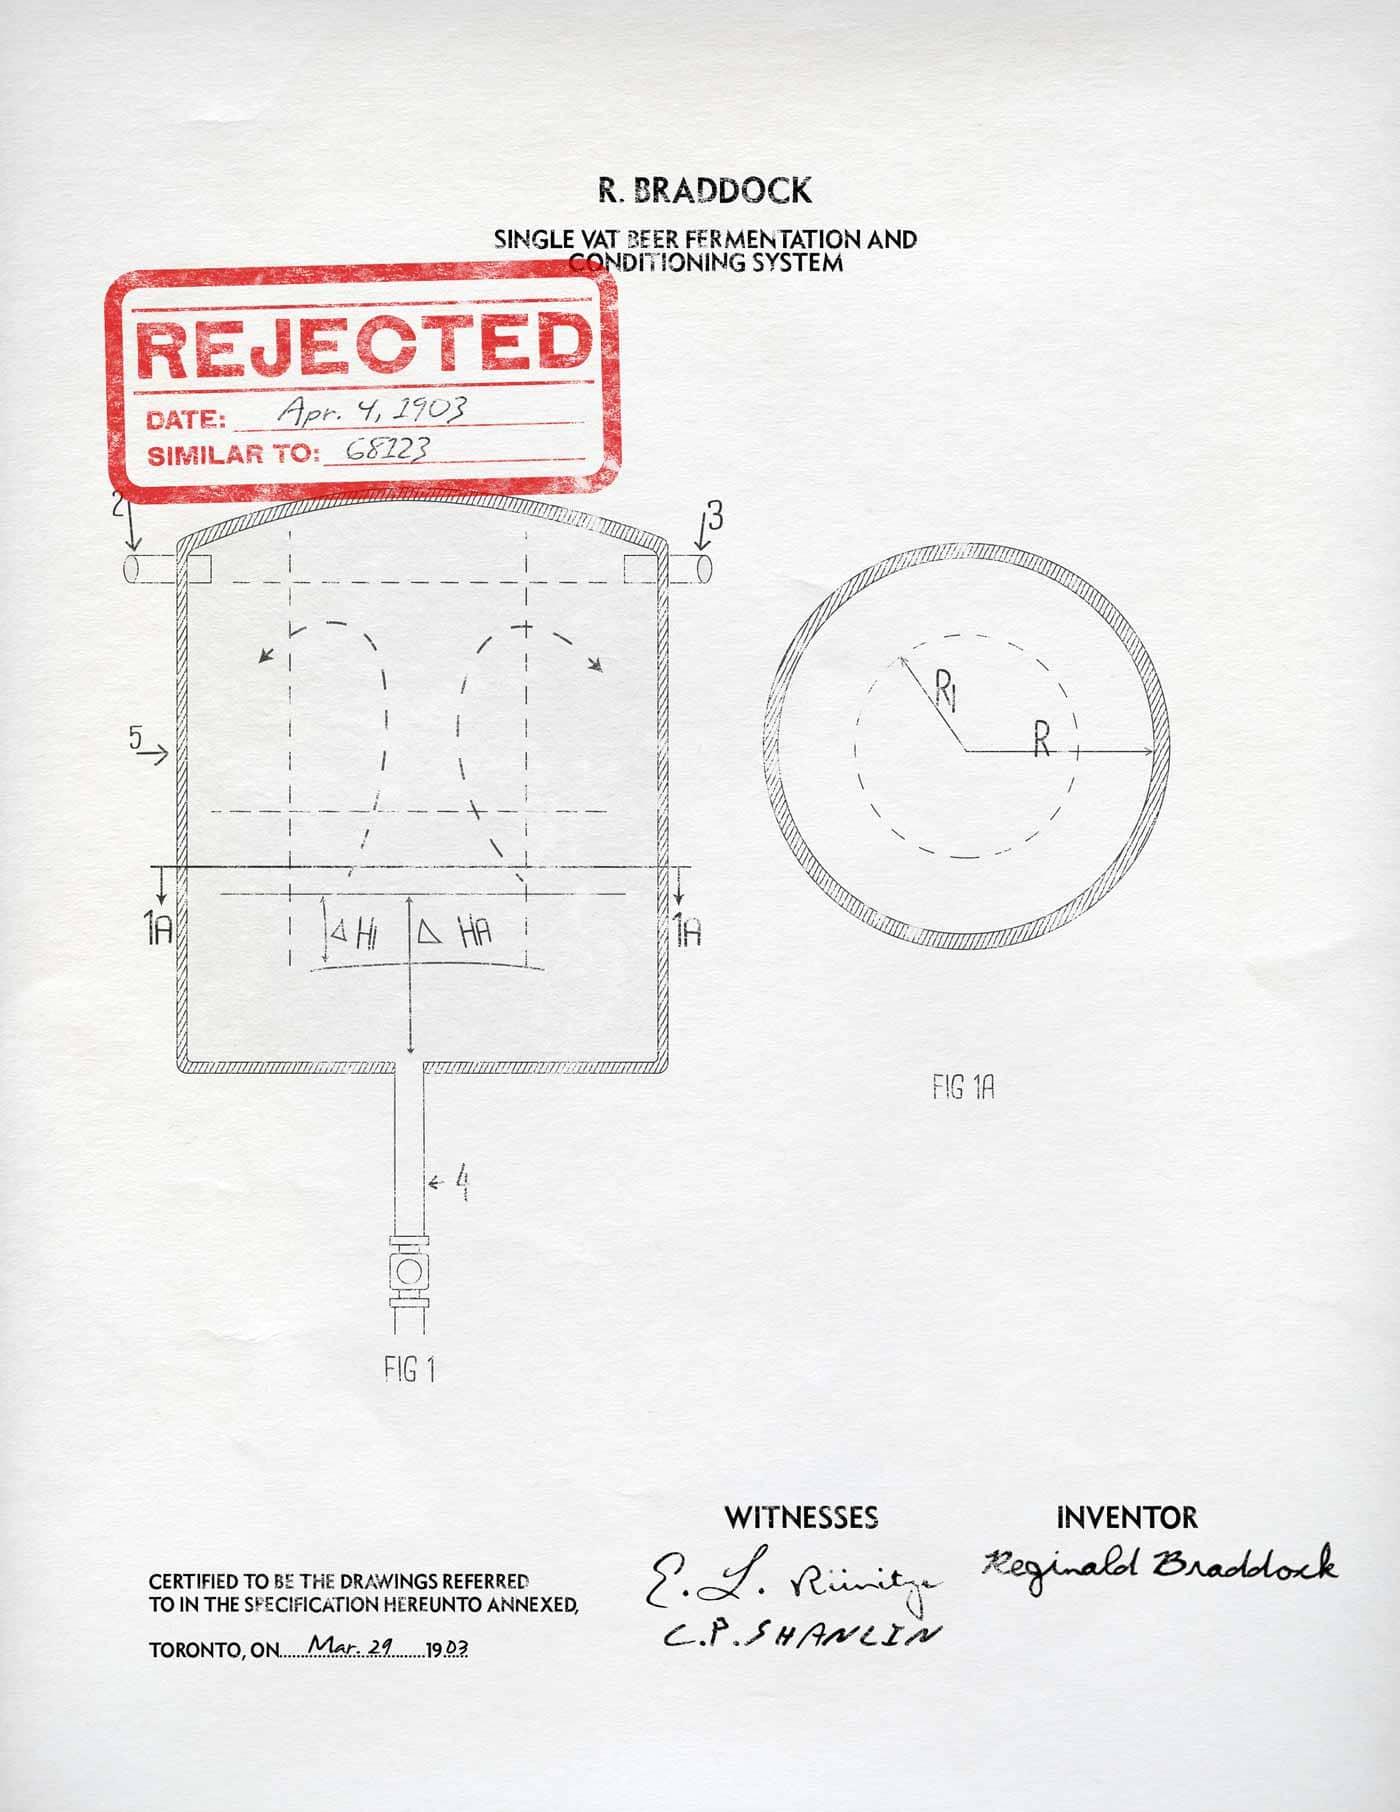 Reginald Braddock's rejected patent application for a beer vat similar to Gareth Wilson's.